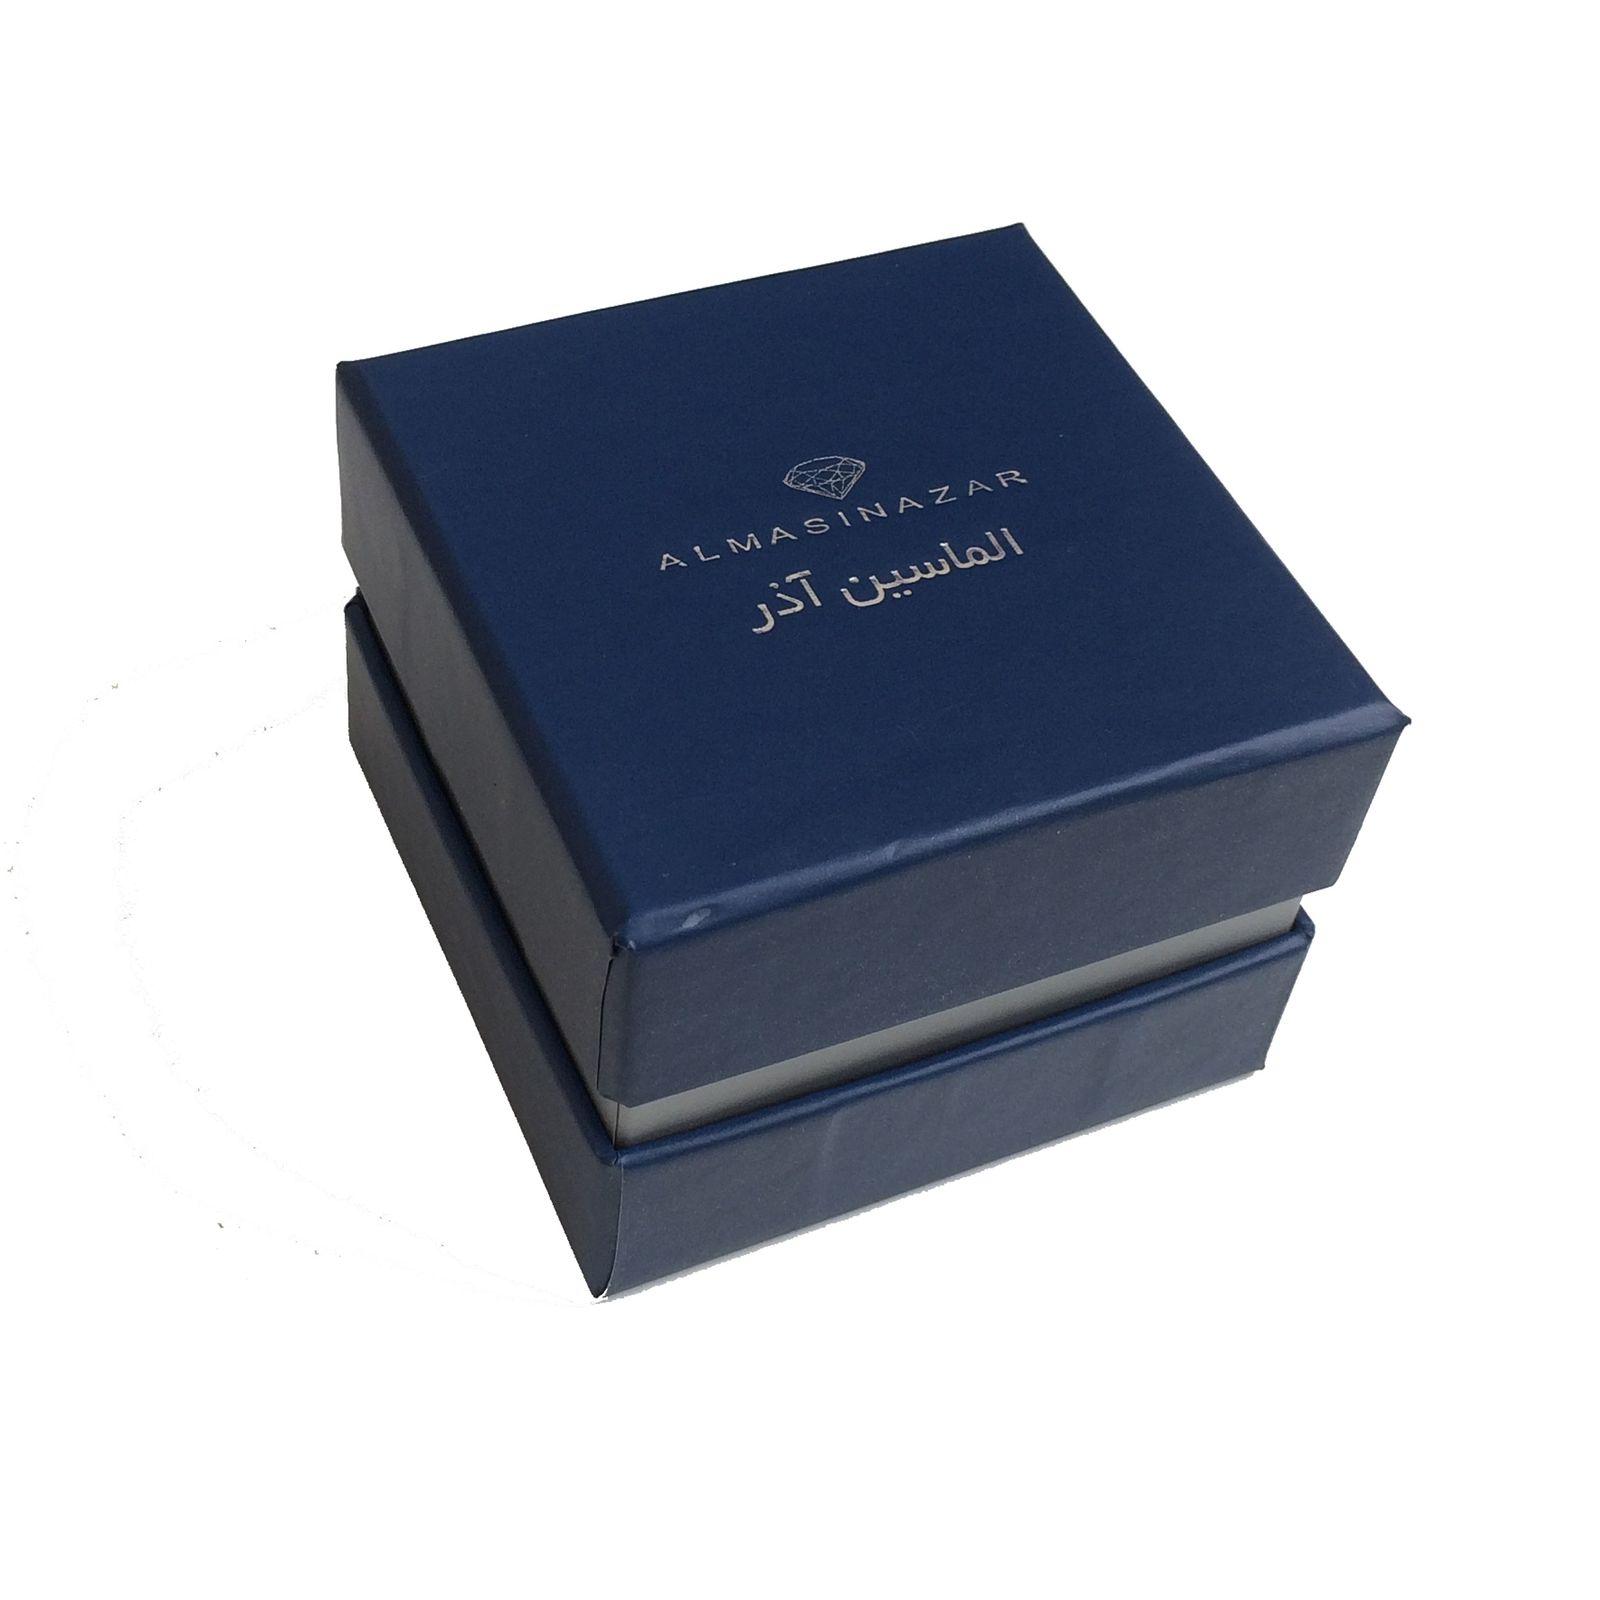 دستبند طلا 18 عیار زنانه الماسین آذر کد GHALB02 -  - 6